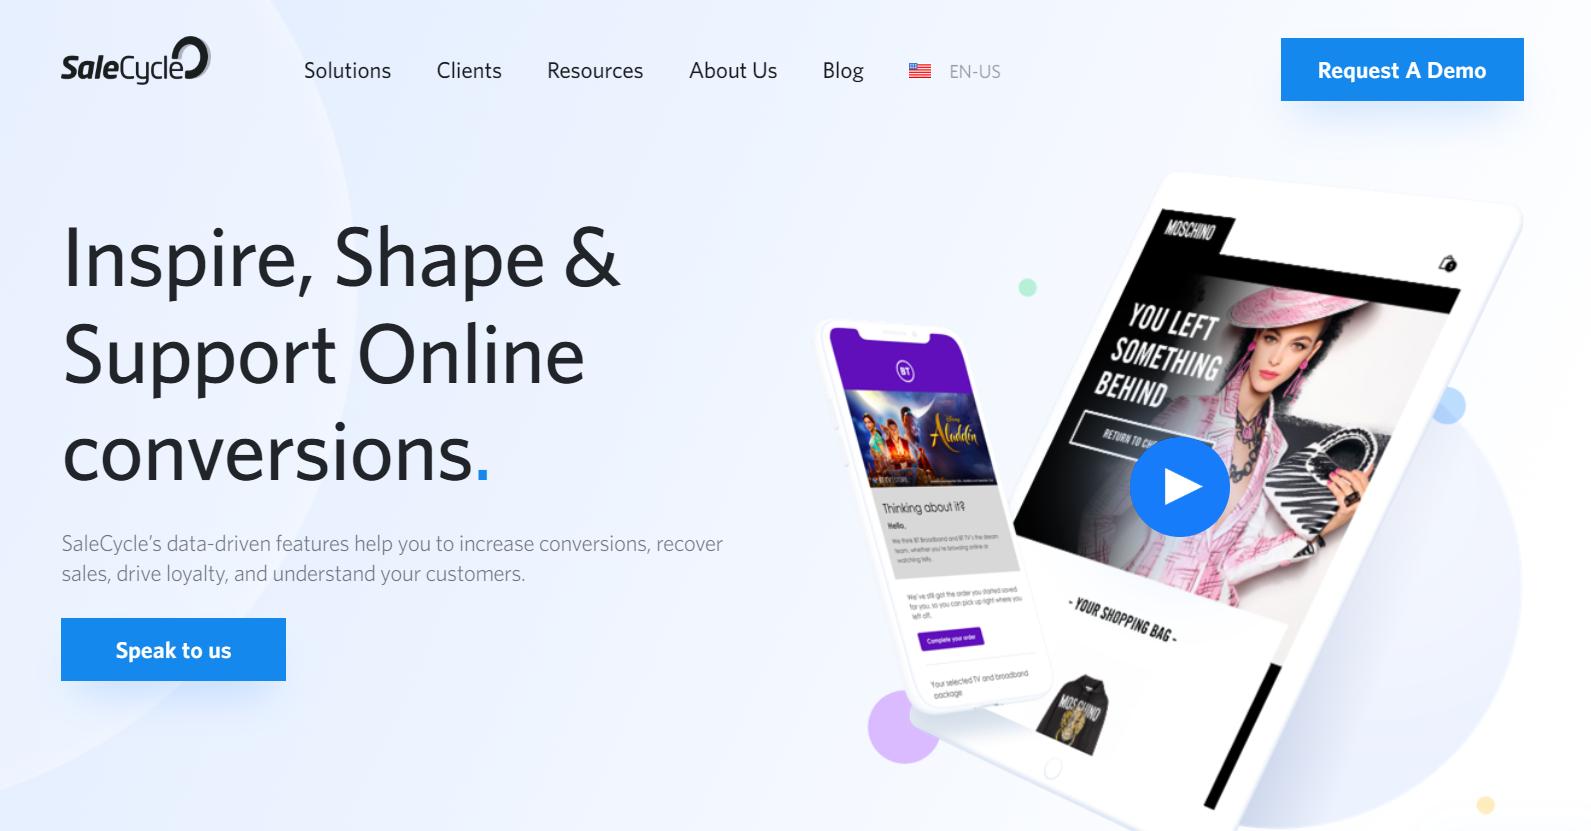 SaleCycle website screenshot